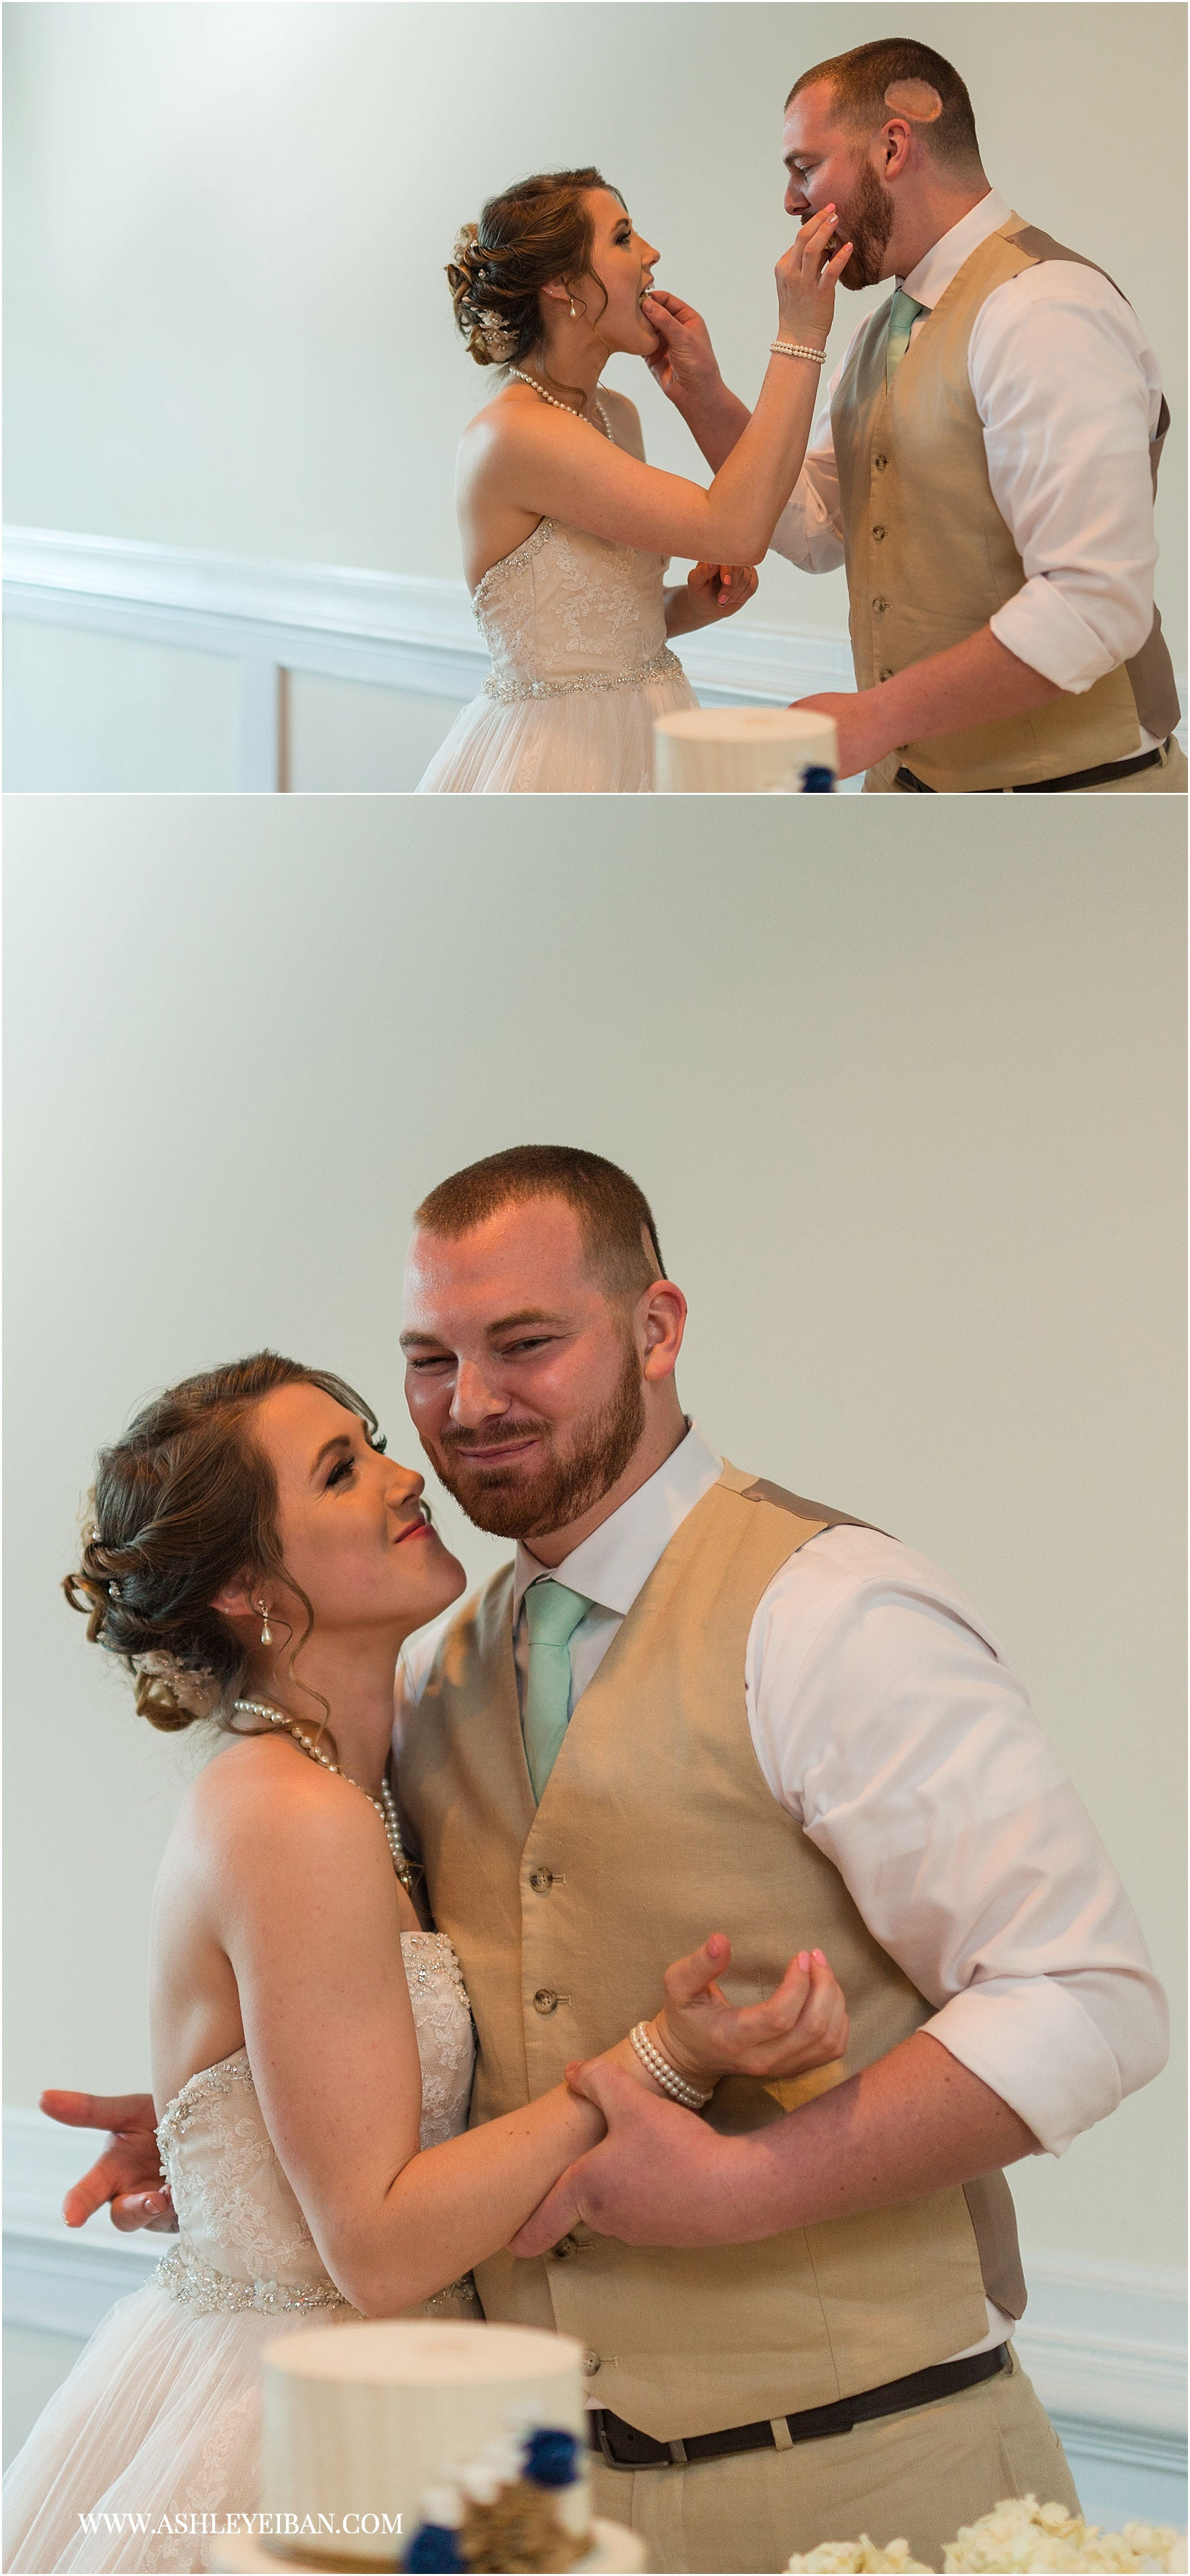 Wedding at The Trivium Estates || Lynchburg, VA Wedding Photographer || Central VA Wedding Photographer || Ashley Eiban Photography || www.ashleyeiban.com